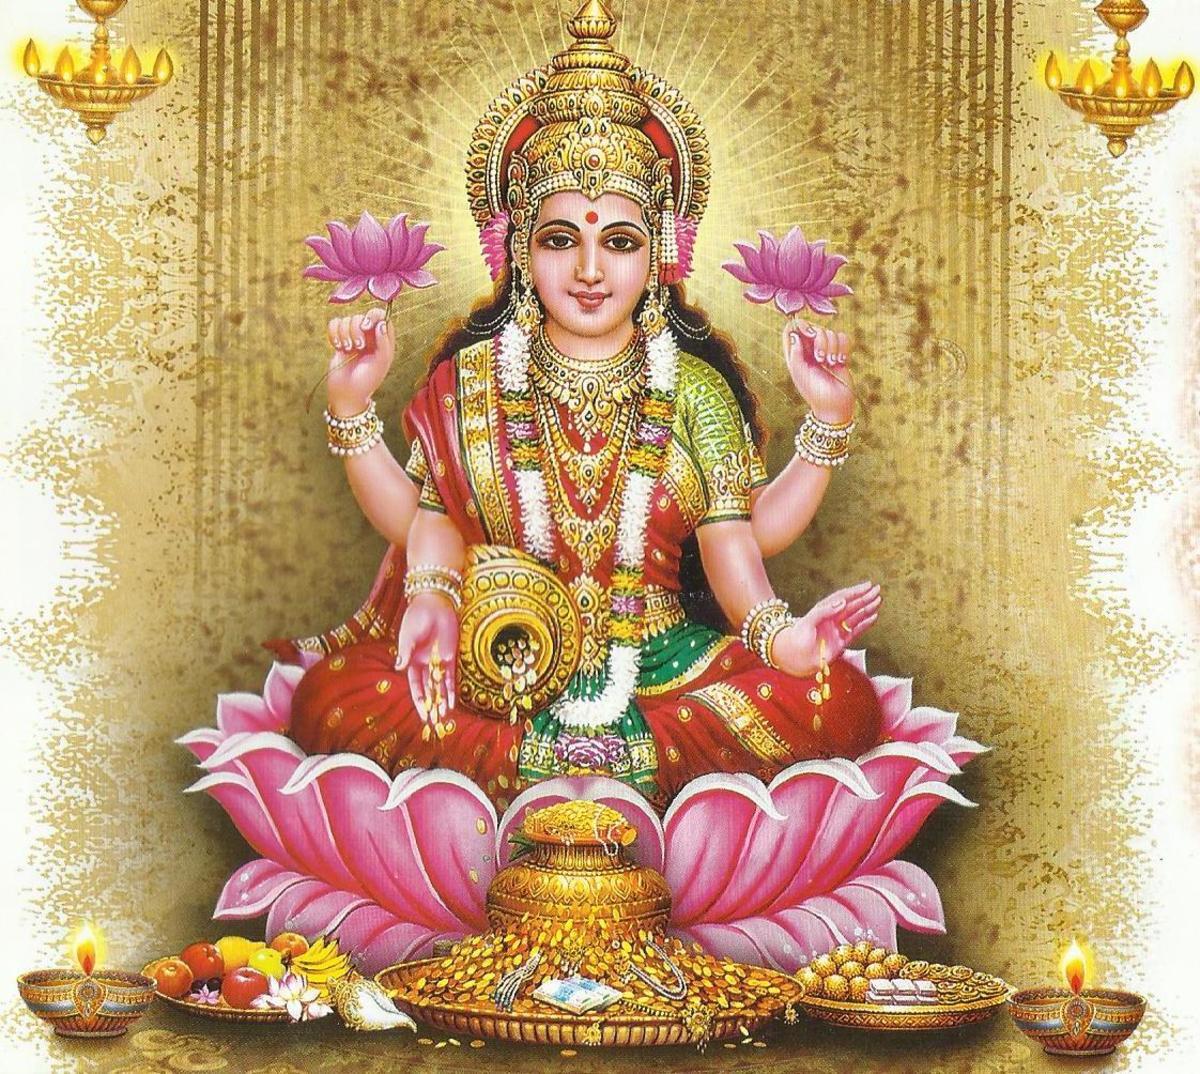 Mantras of Goddess Maha Lakshmi